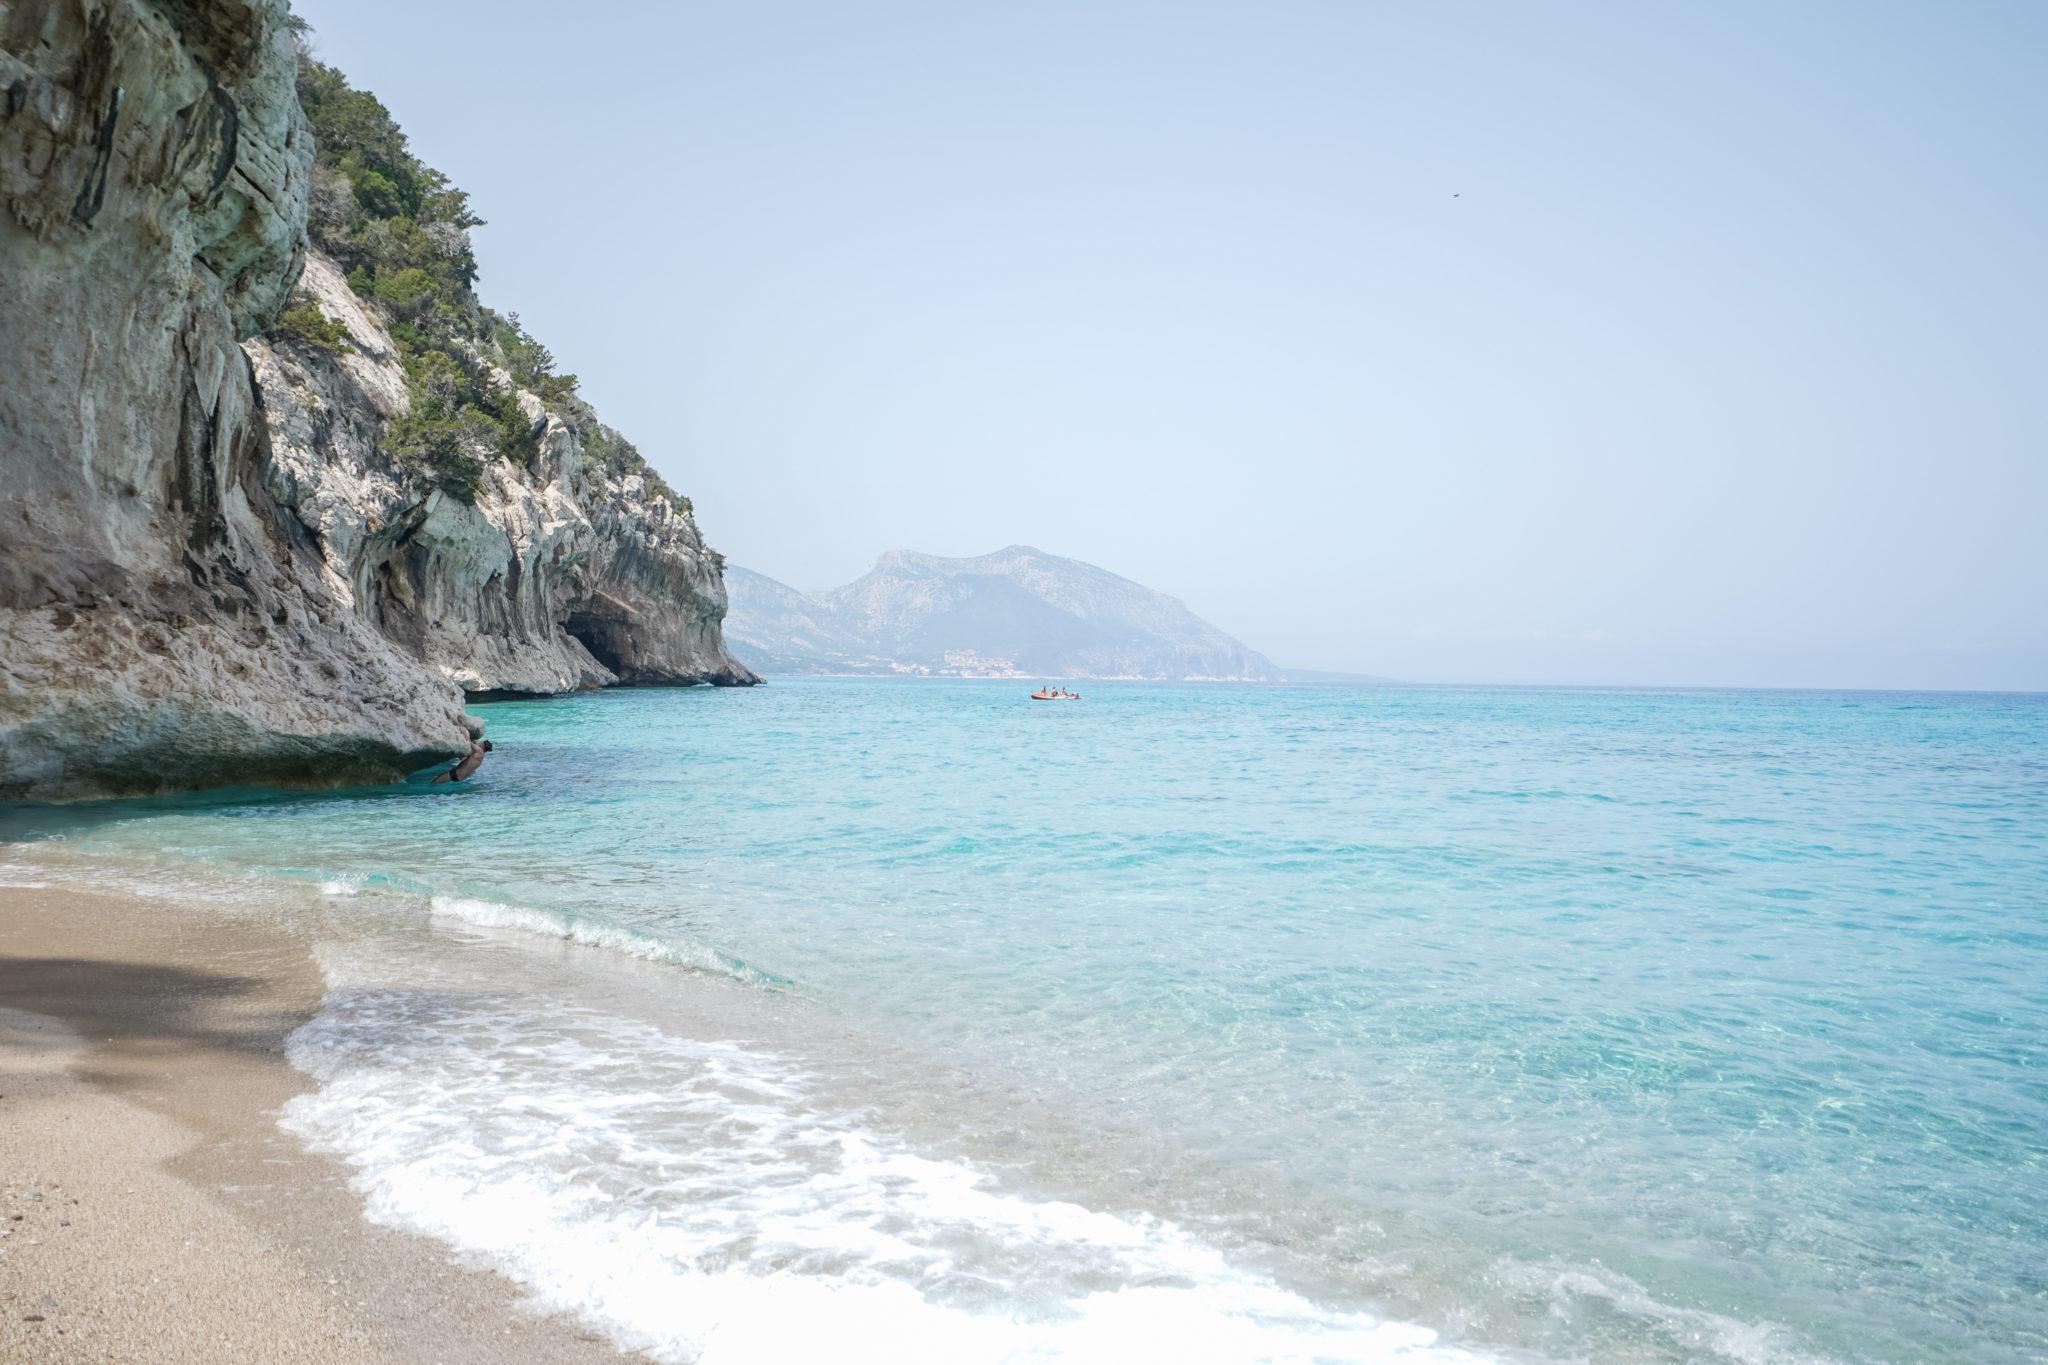 golfo-orosei-sardaigne-visite-paradis-voyage-italie